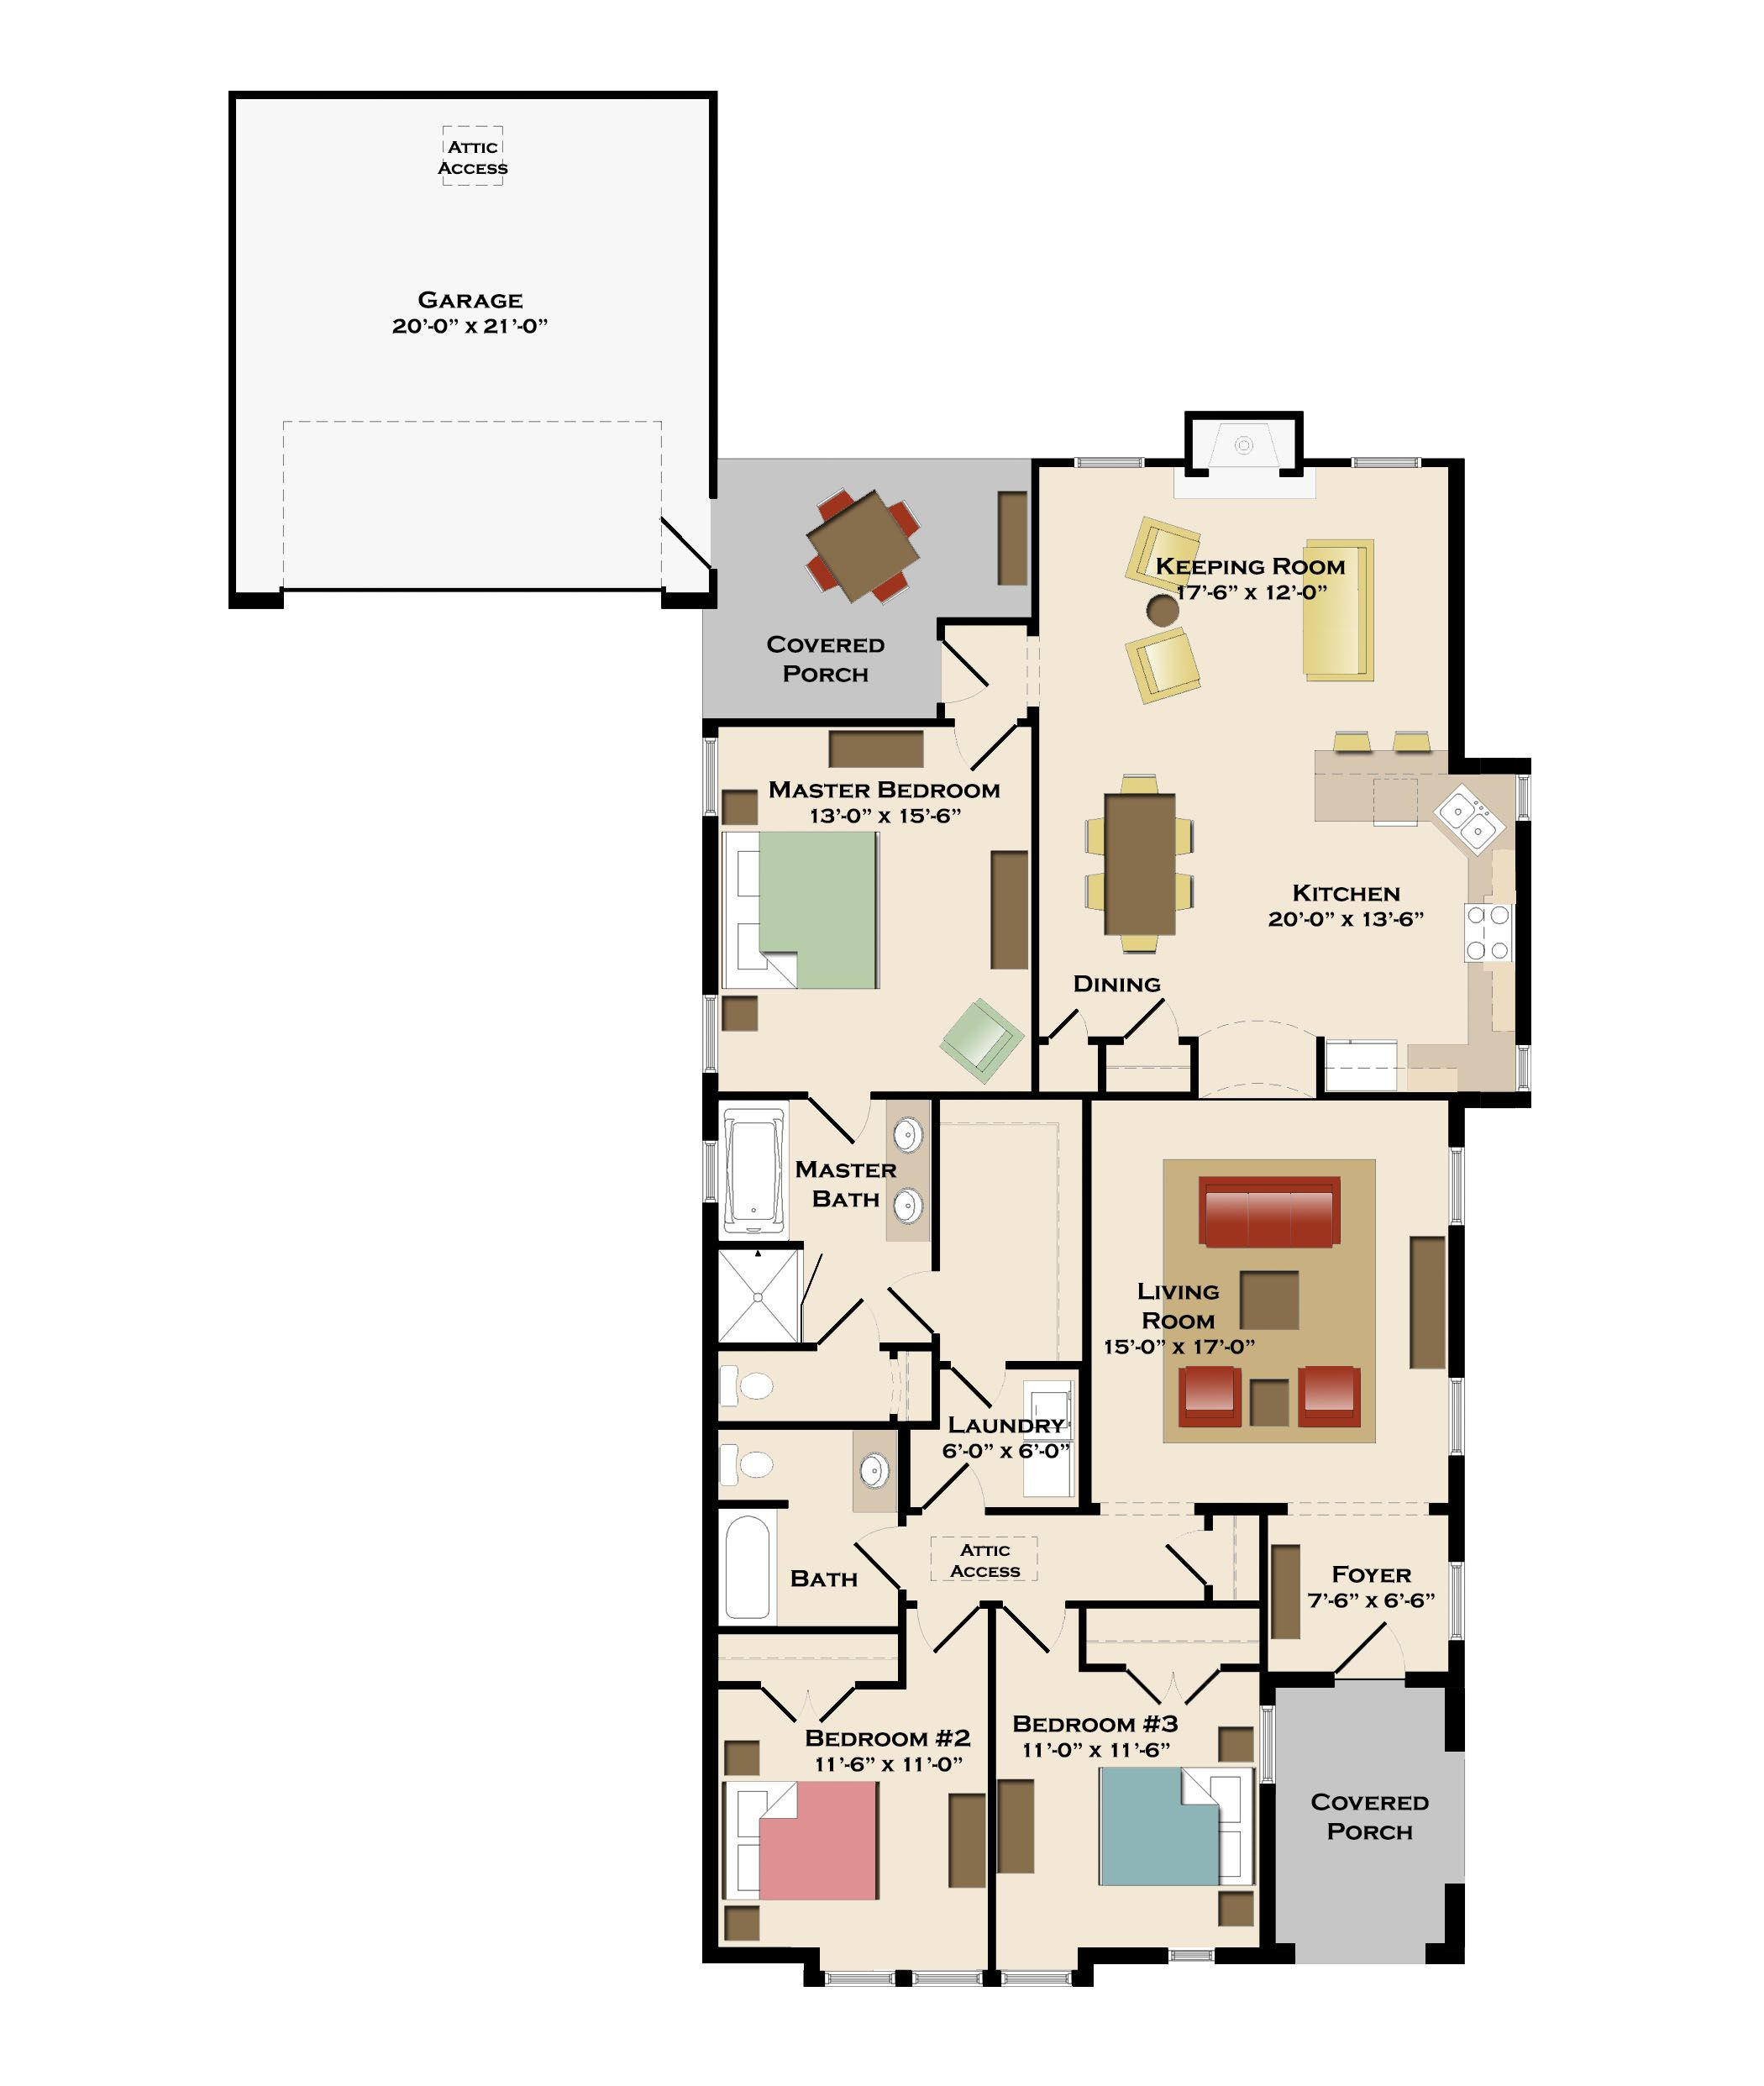 Fairfax A Home Plan in Cypress Point, Alabama Harris